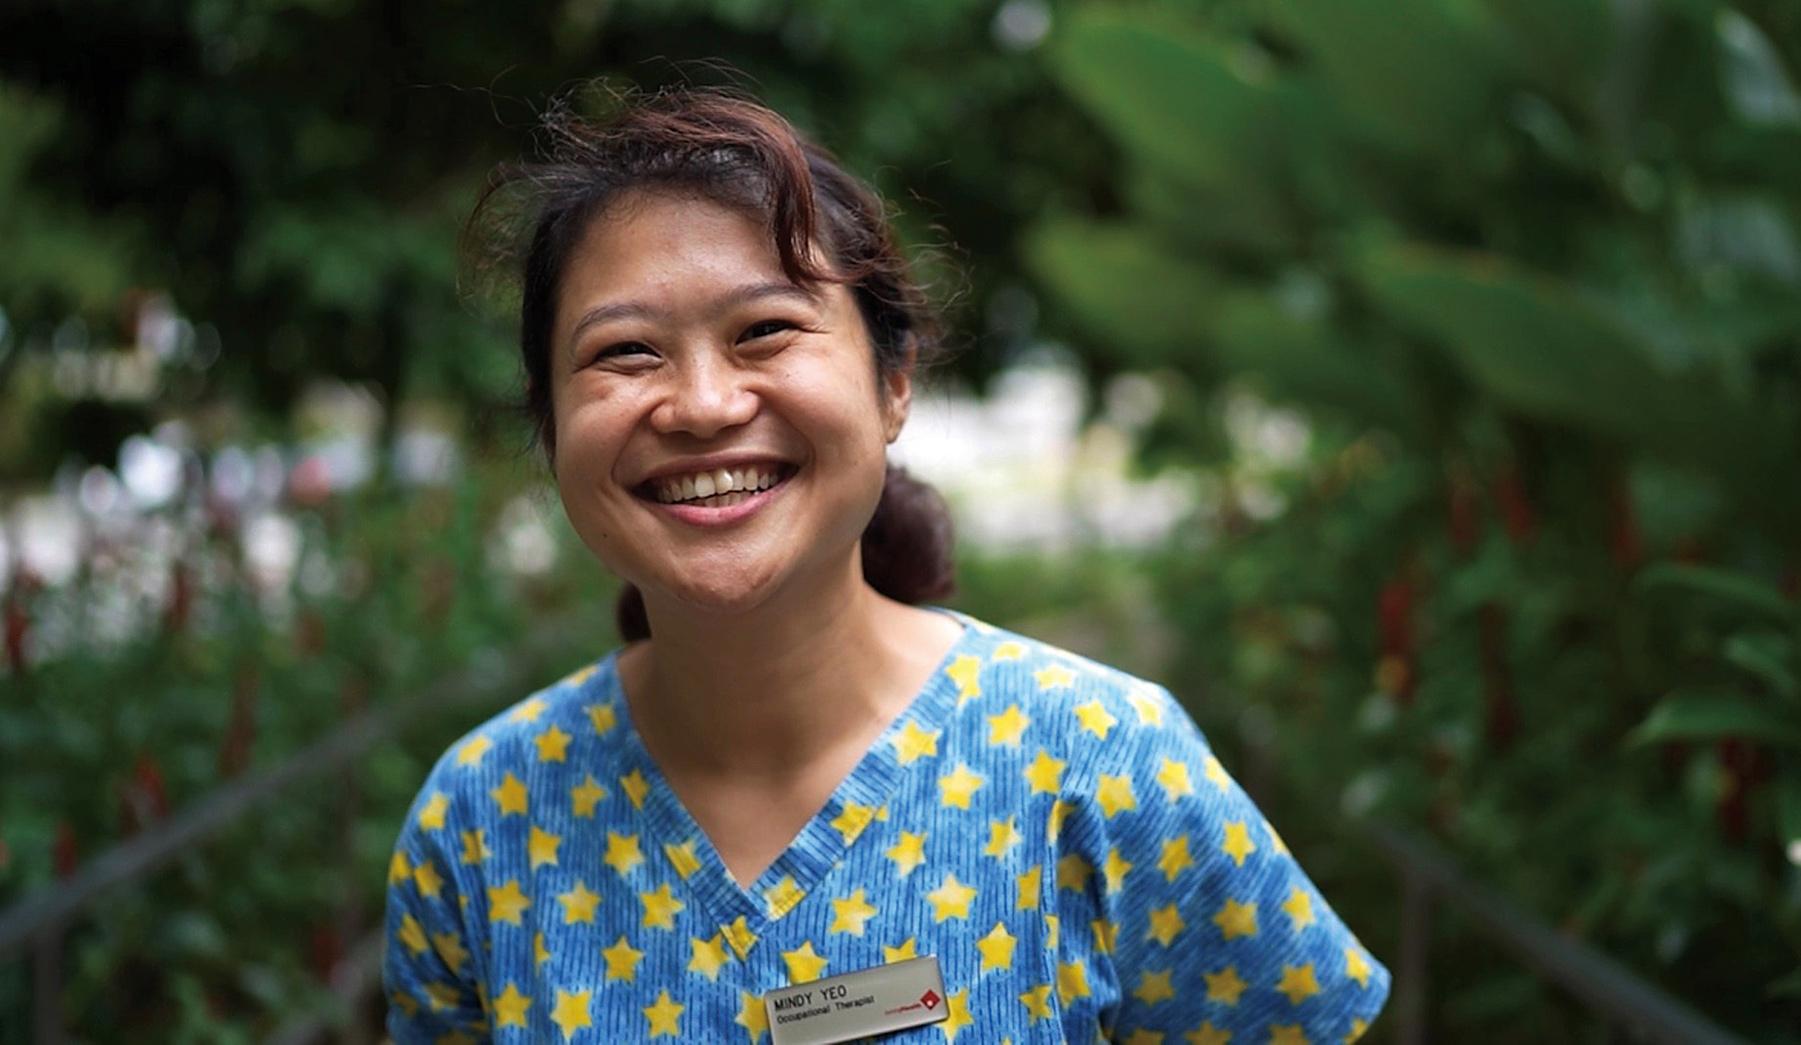 Mindy Yeo Hui Rong